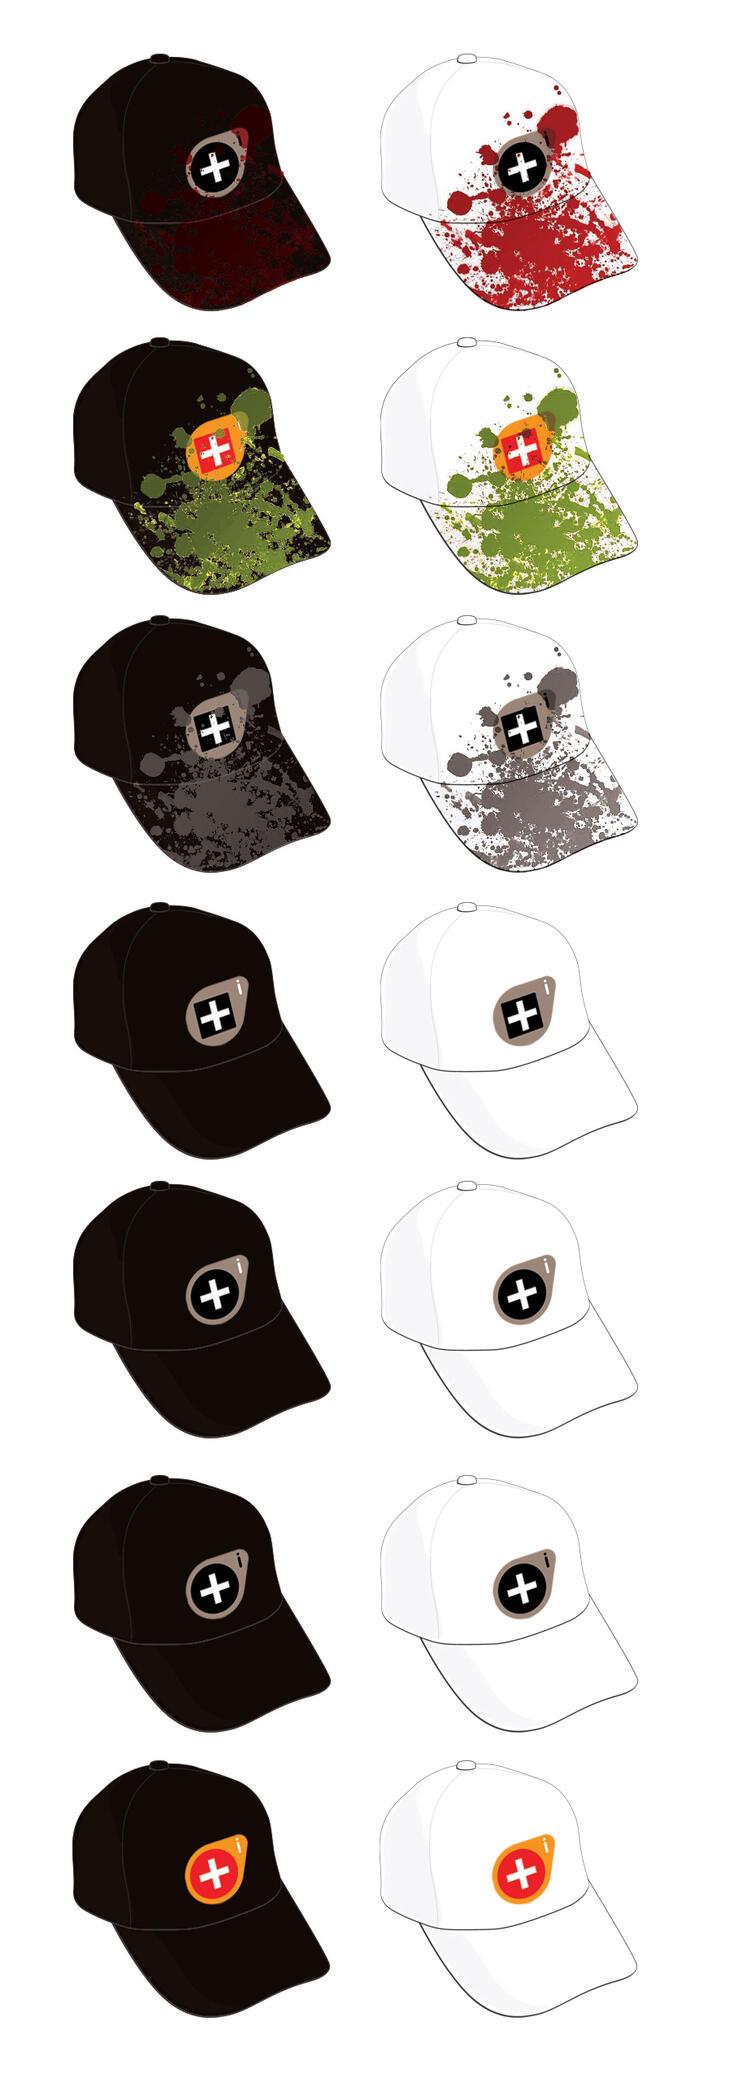 l4d_hats.jpg